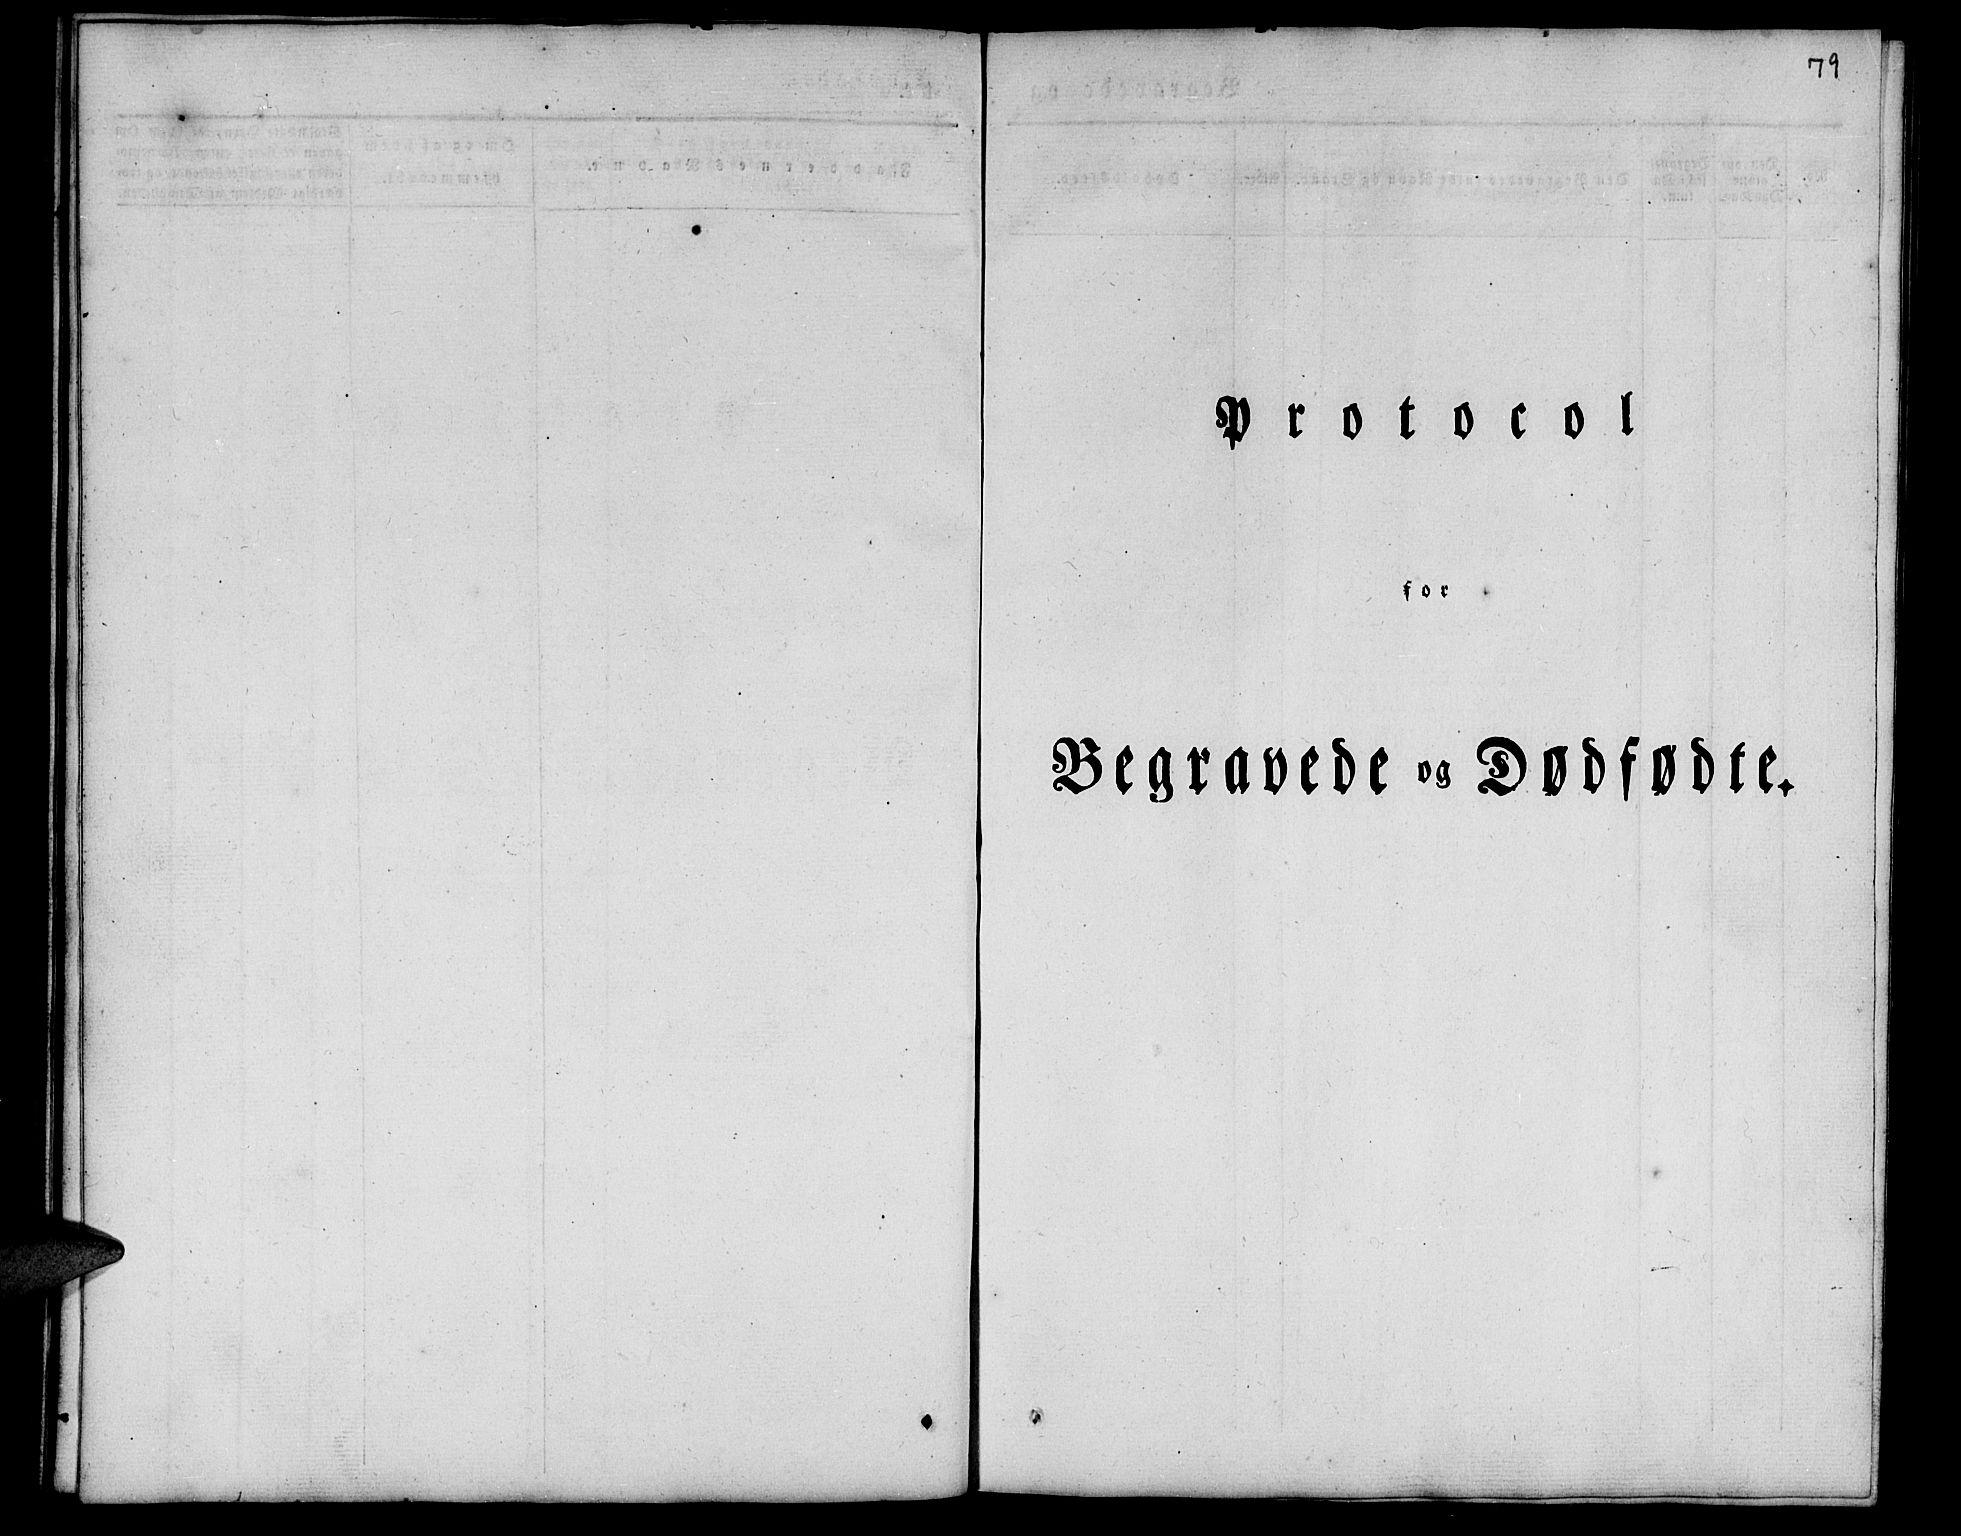 SATØ, Tranøy sokneprestkontor, I/Ia/Iab/L0010klokker: Klokkerbok nr. 10, 1835-1844, s. 79